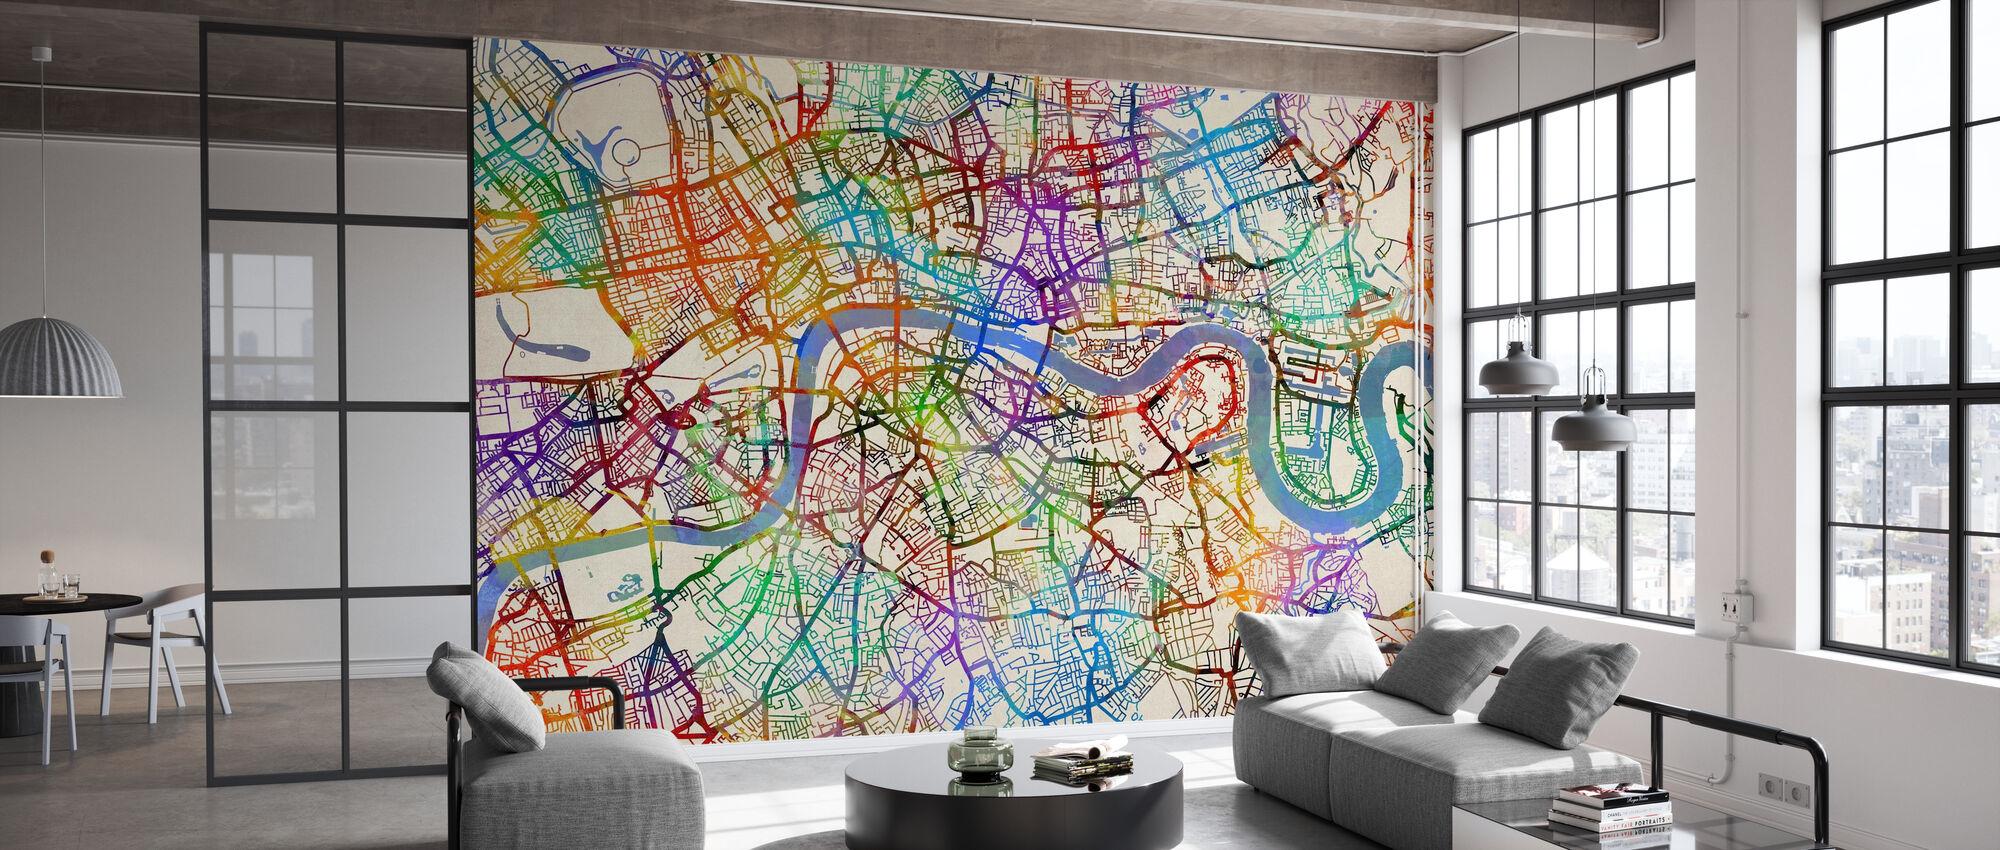 London England Street Map - Wallpaper - Office